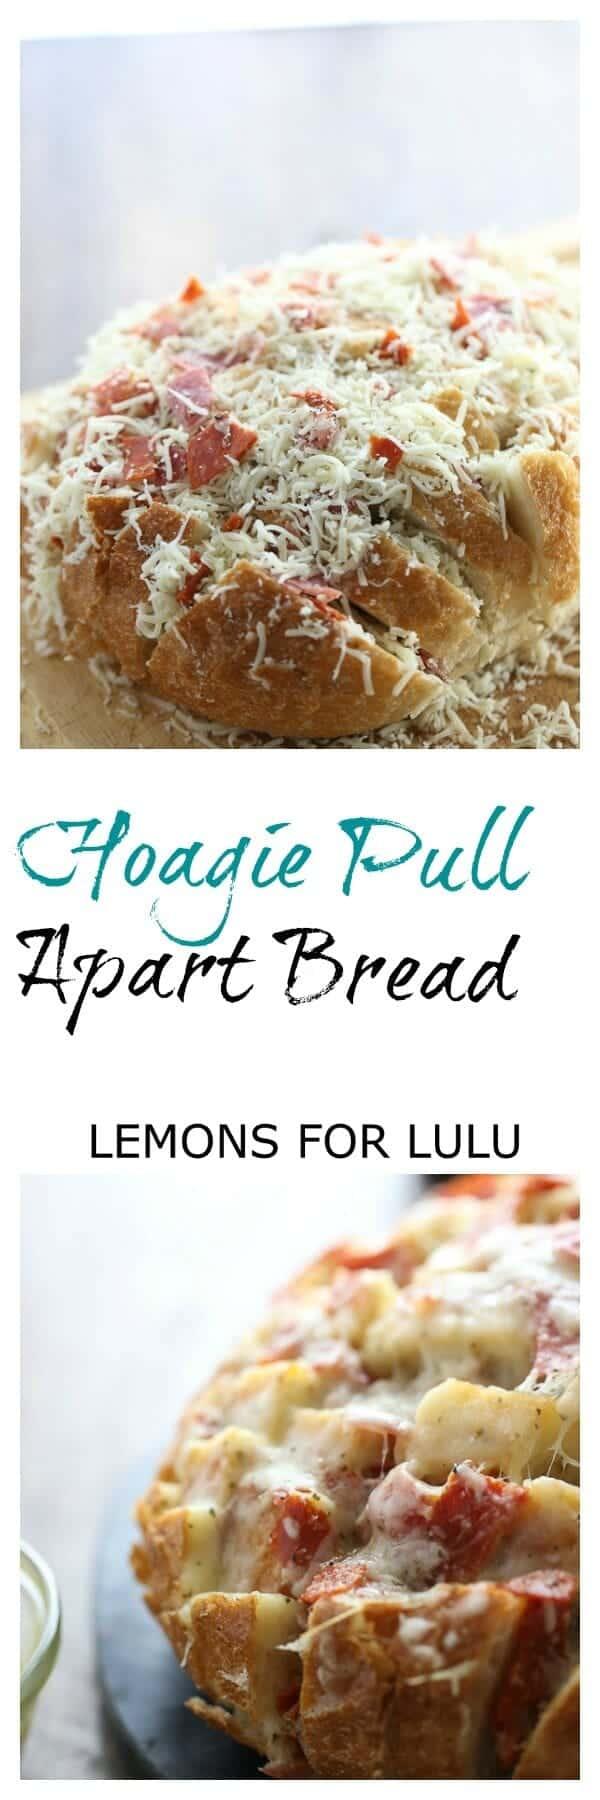 The best part of a hoagie sandwich in one big cheesy pull apart bread! lemonsforlulu.com